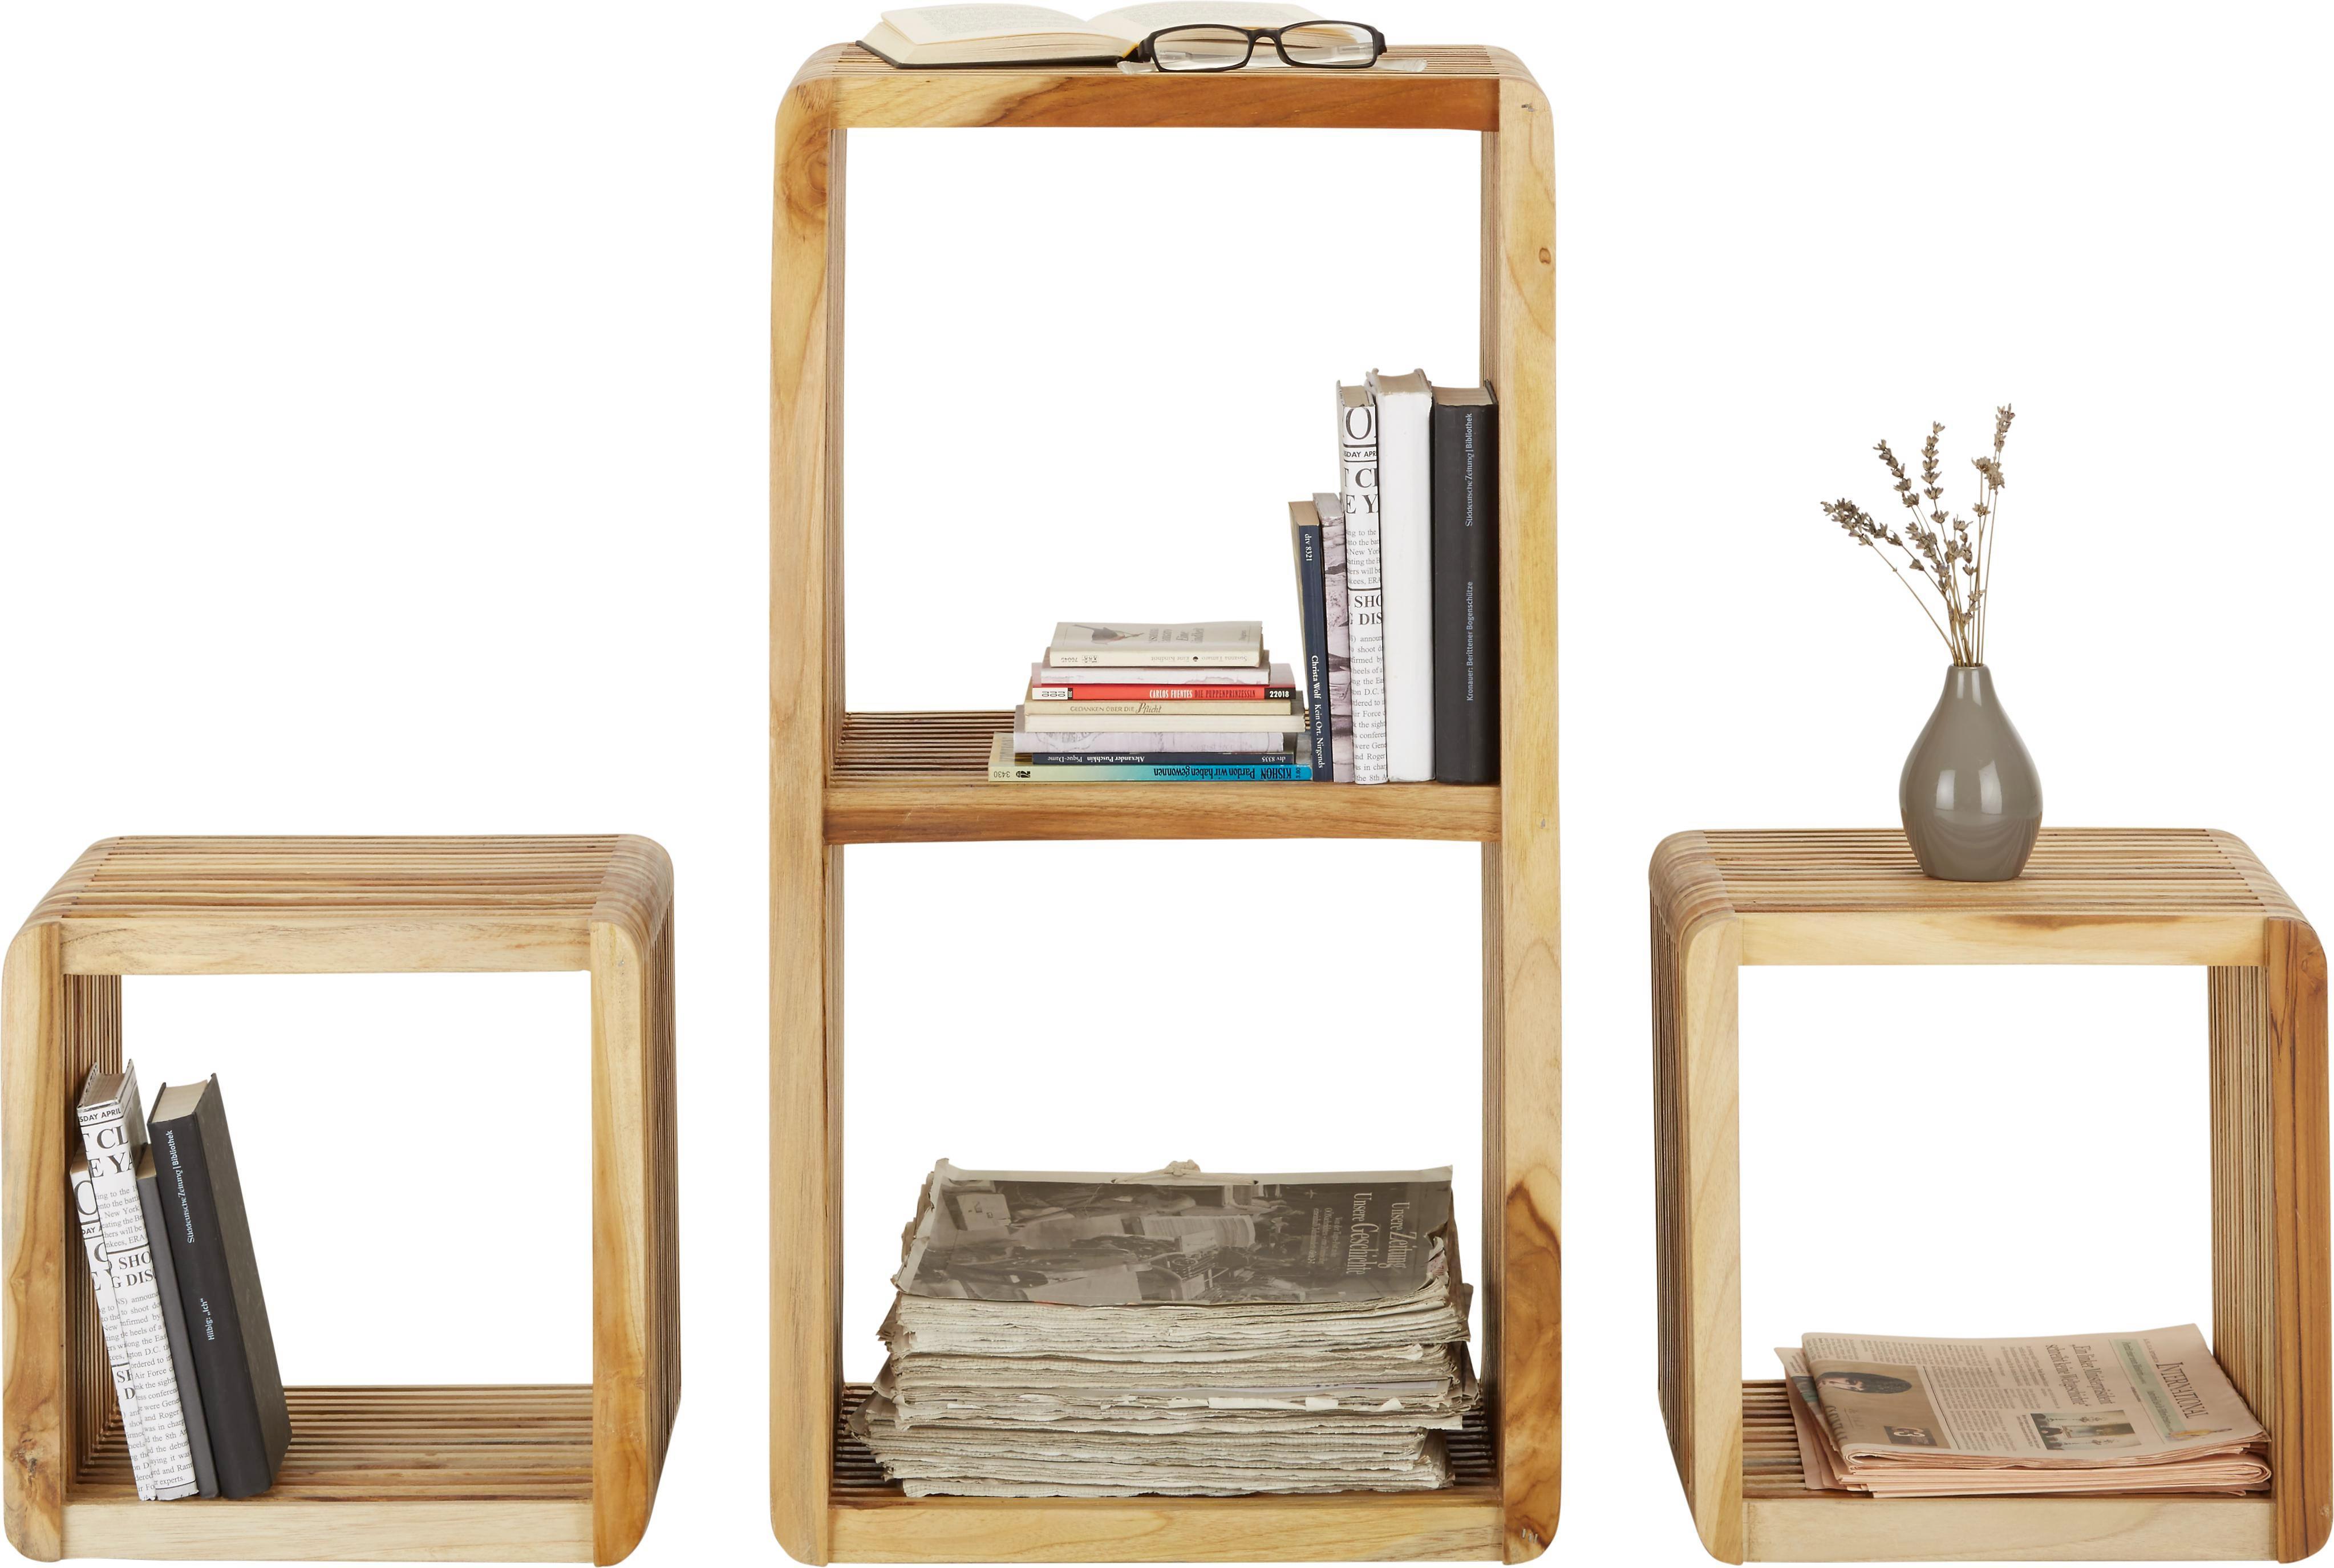 moderne bcherregale interesting eckschrank sonoma eiche modest sonoma eiche elegant tv with. Black Bedroom Furniture Sets. Home Design Ideas